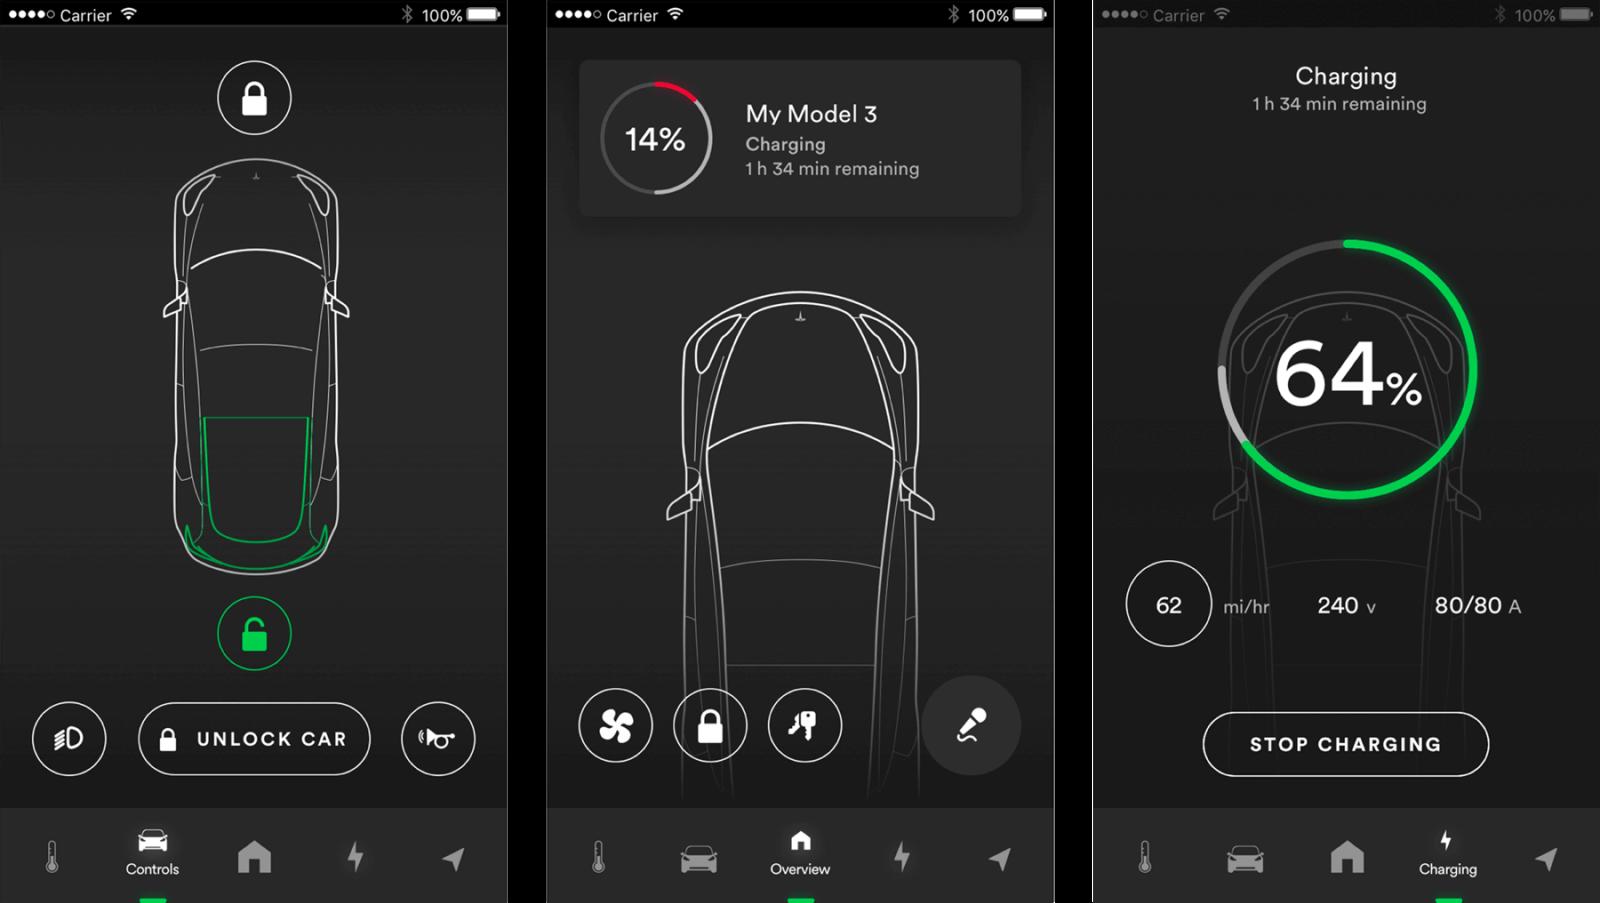 Tesla x Spotify - Caraoke